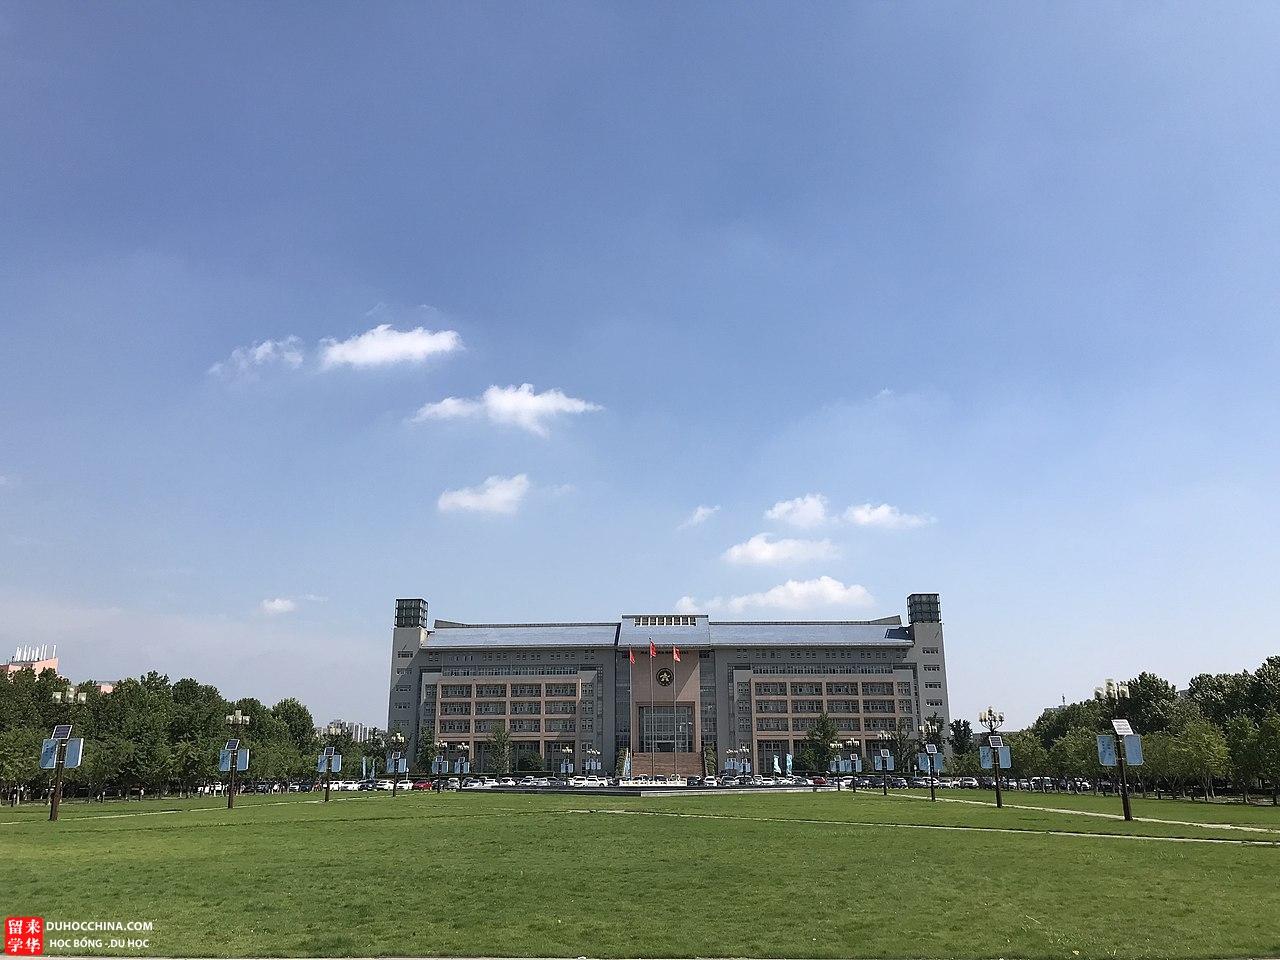 duhoctrungquoc.vn 1280px Zhengzhou University Administrative Building 1585086994